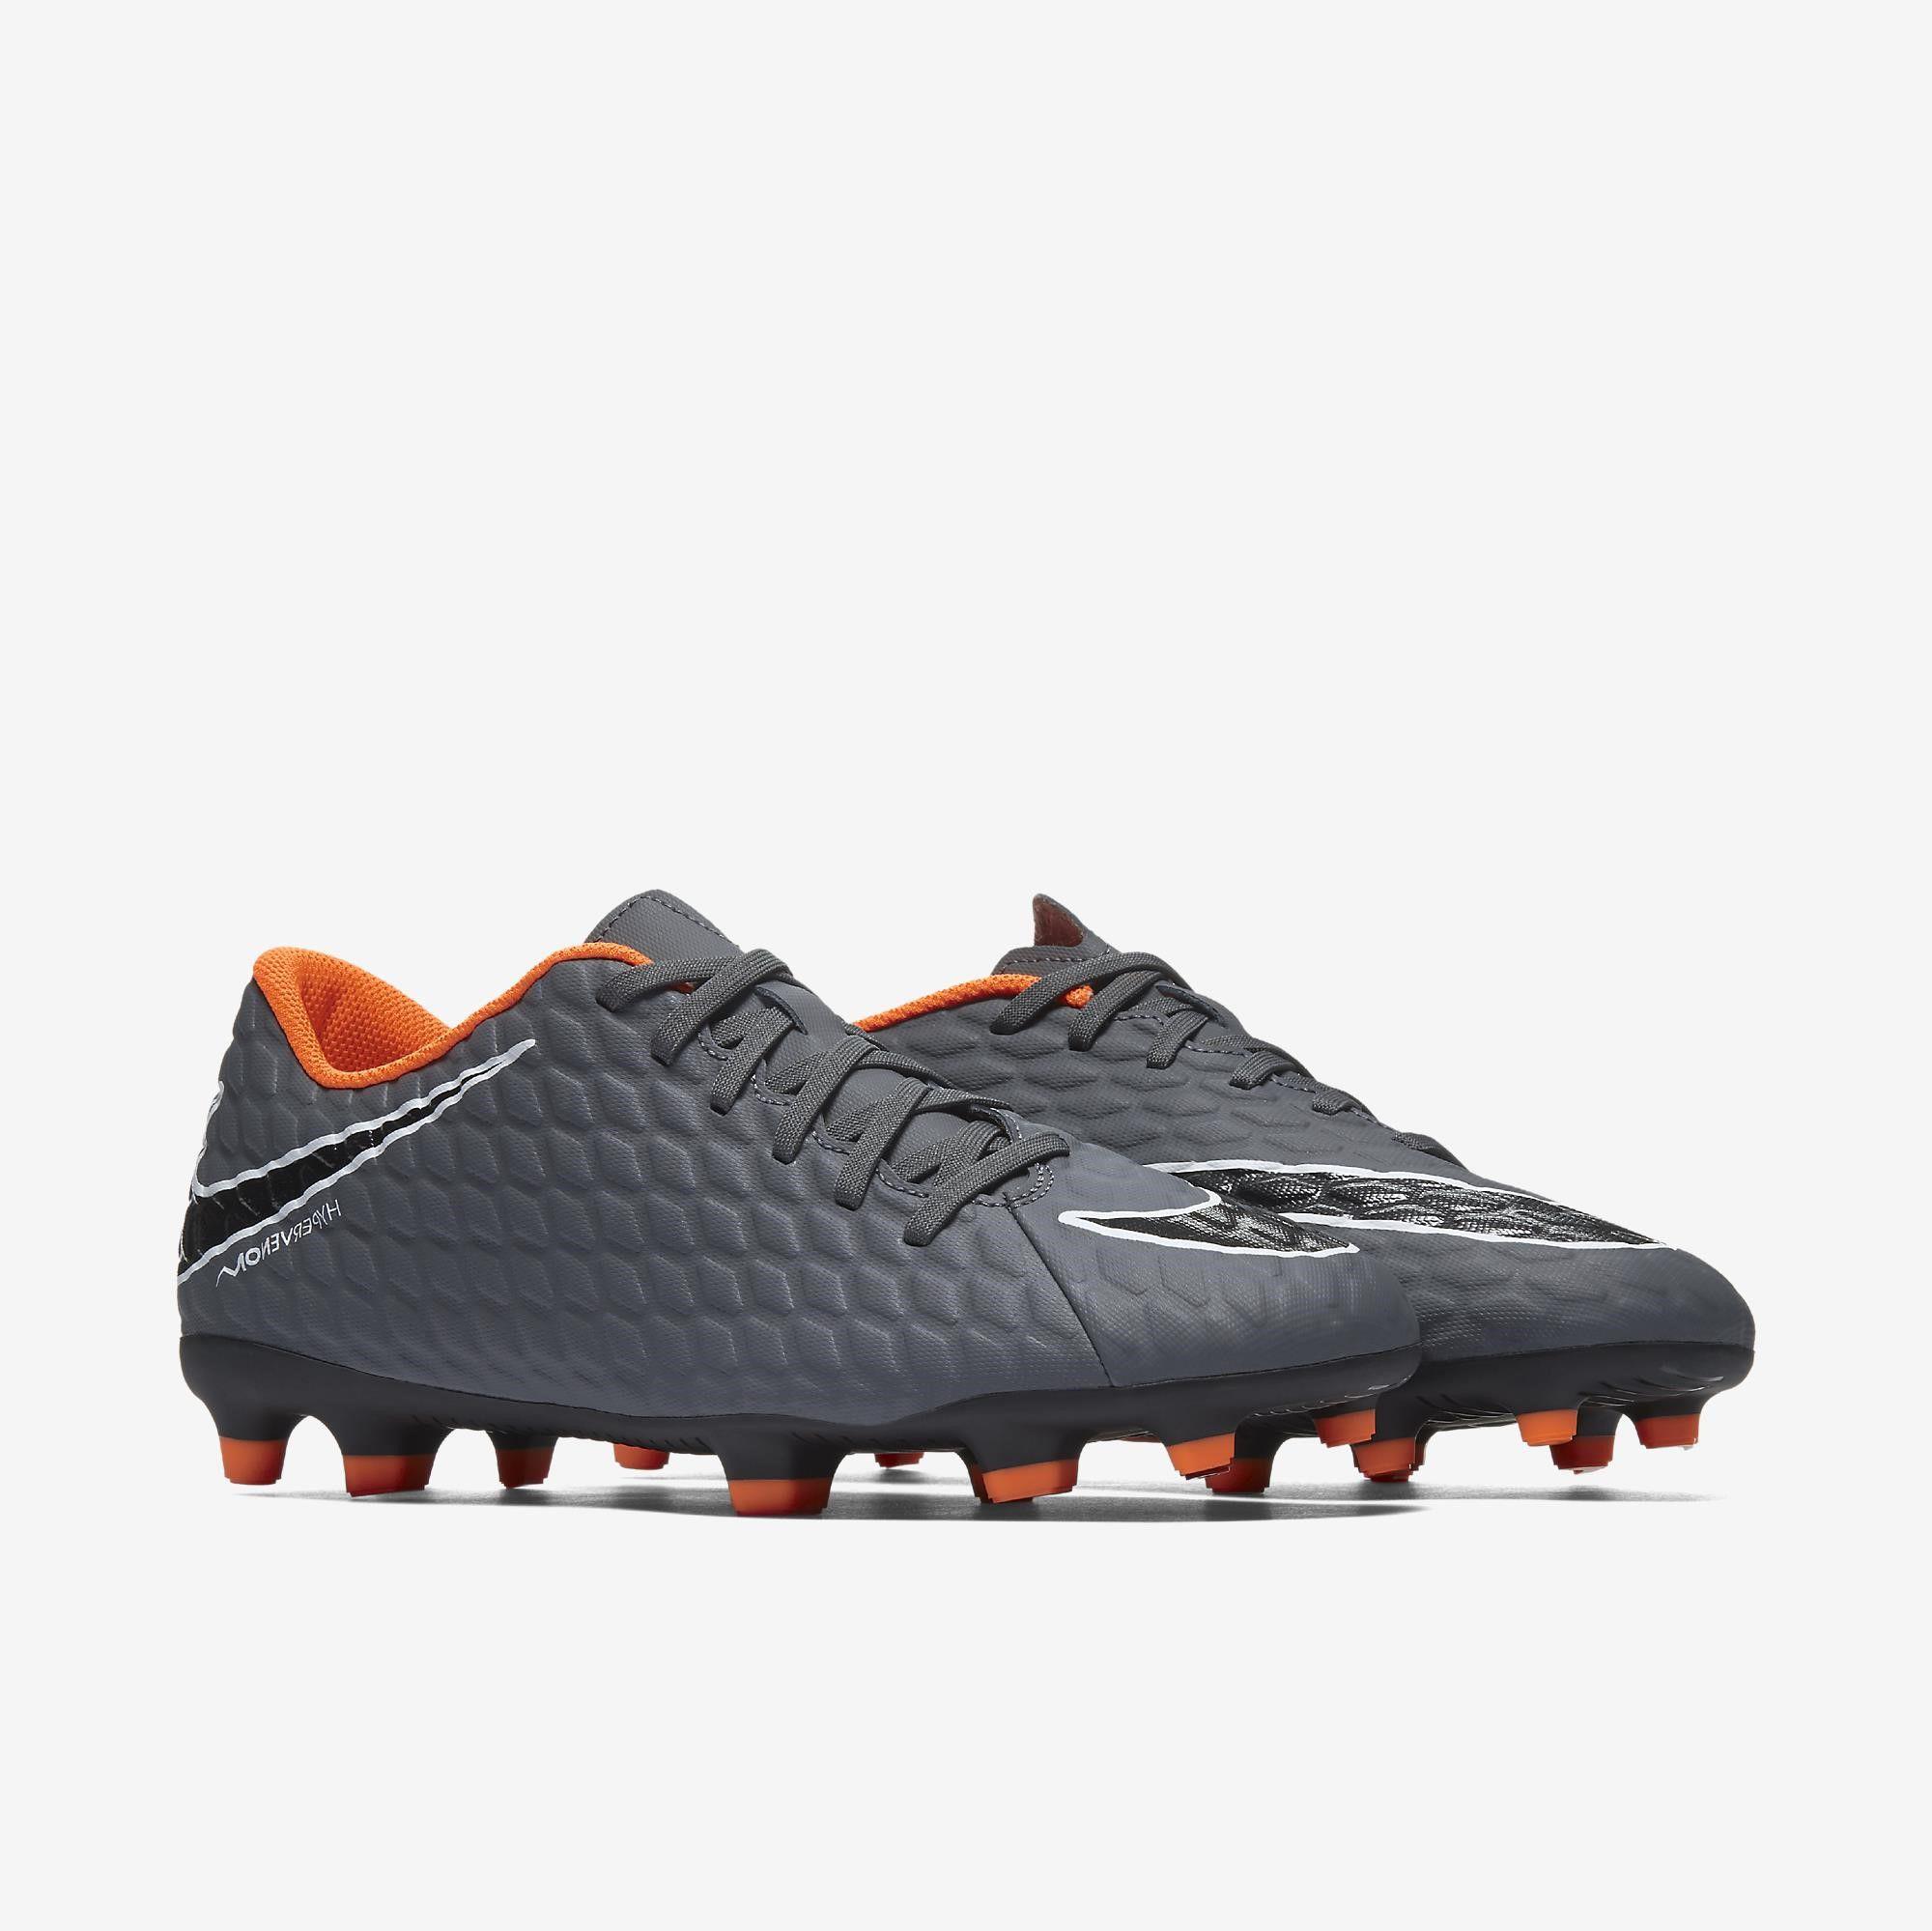 743a5f3bc406a Chuteira Campo Nike Hypervenom Phantom 3 Club Fg -cinza Laranja ...